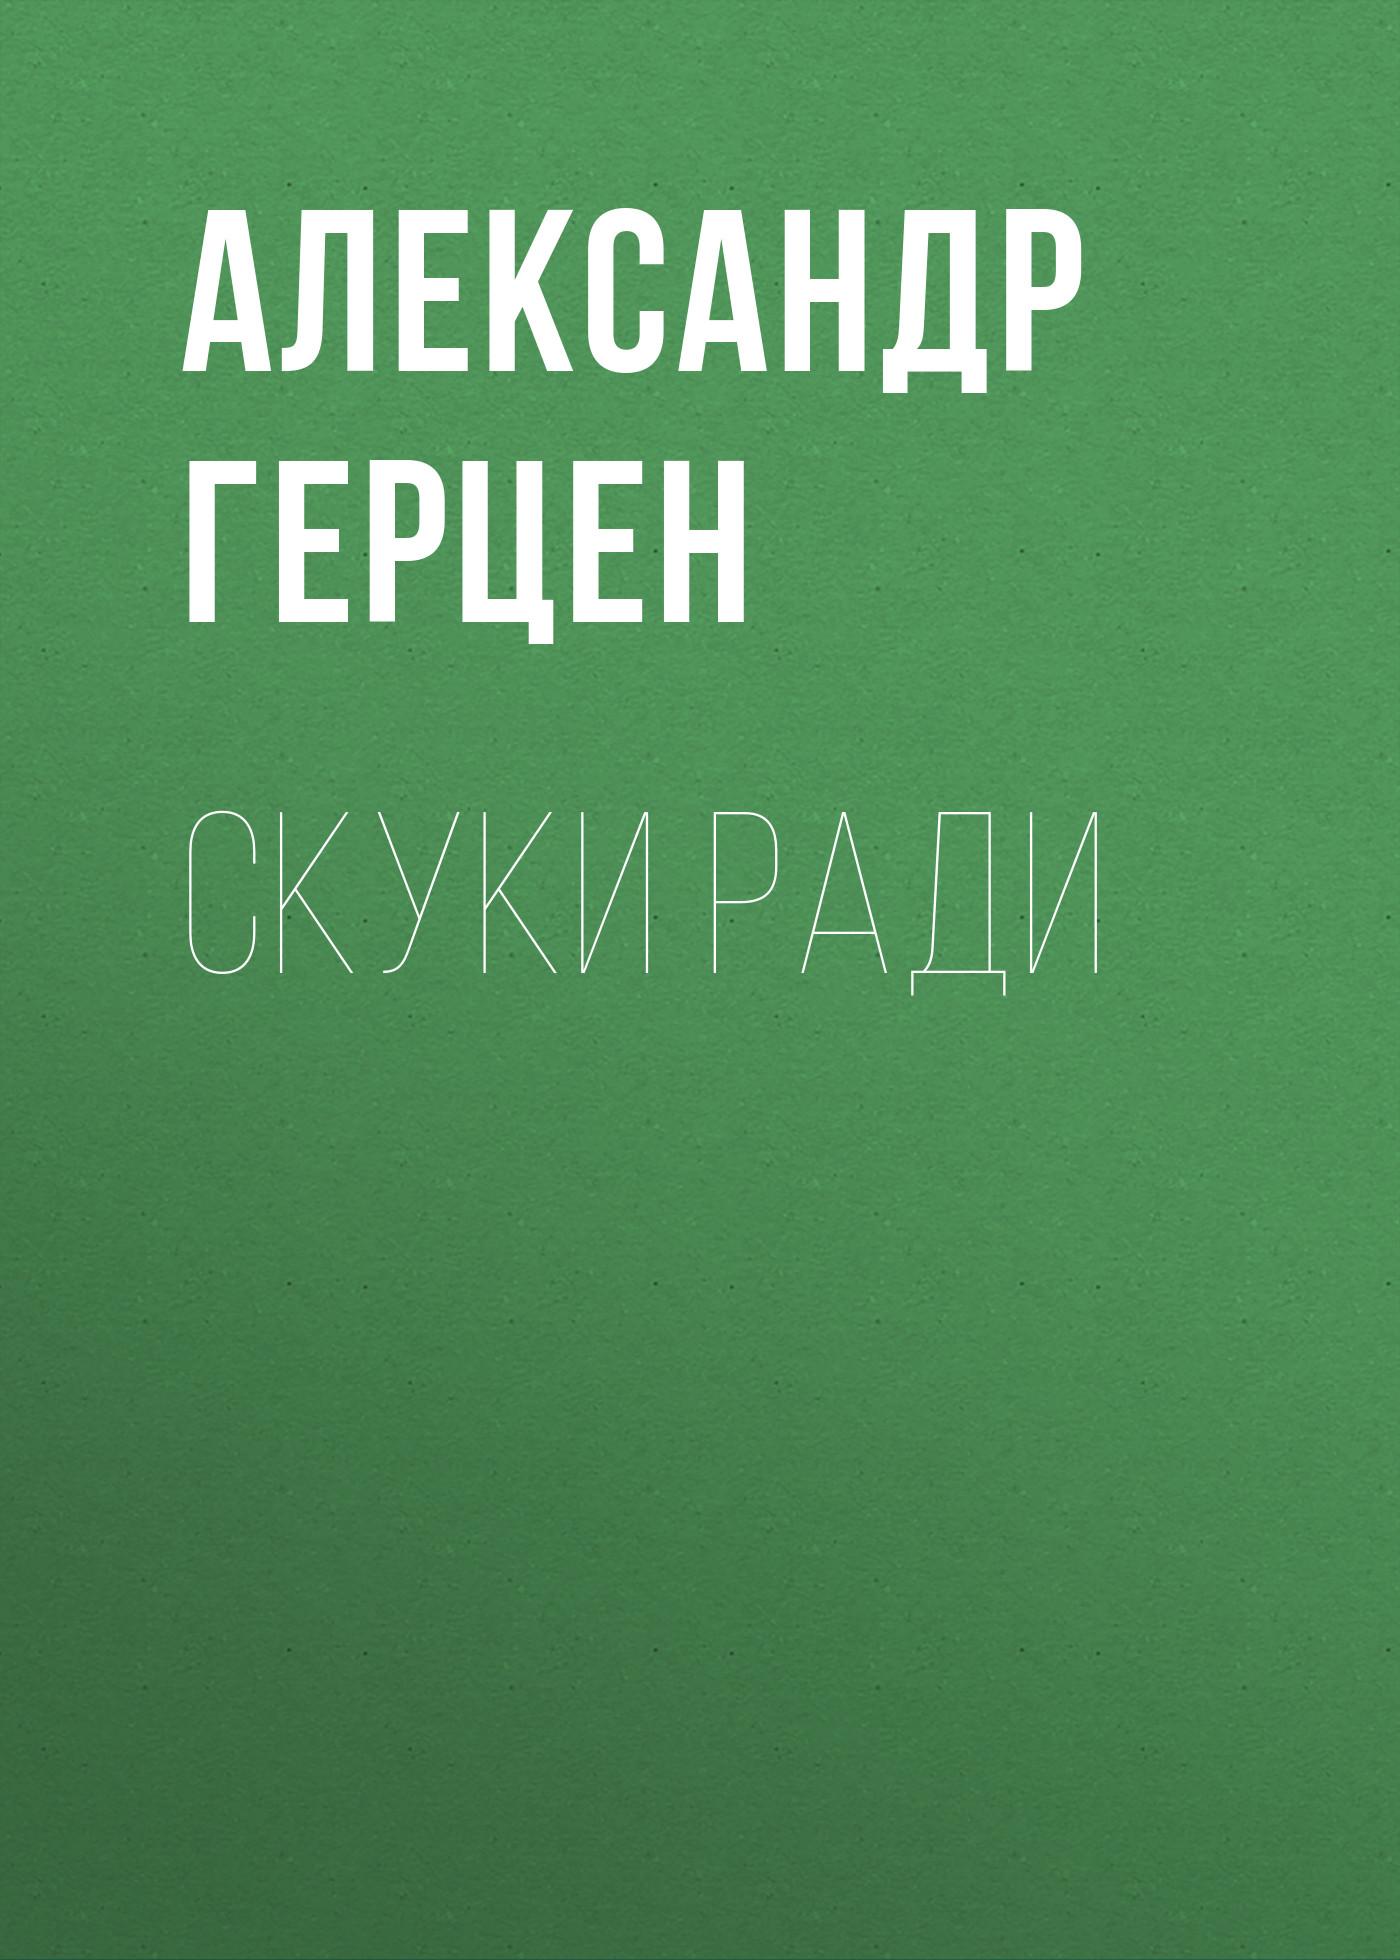 Александр Герцен Скуки ради eichhorn вагон с цистерной